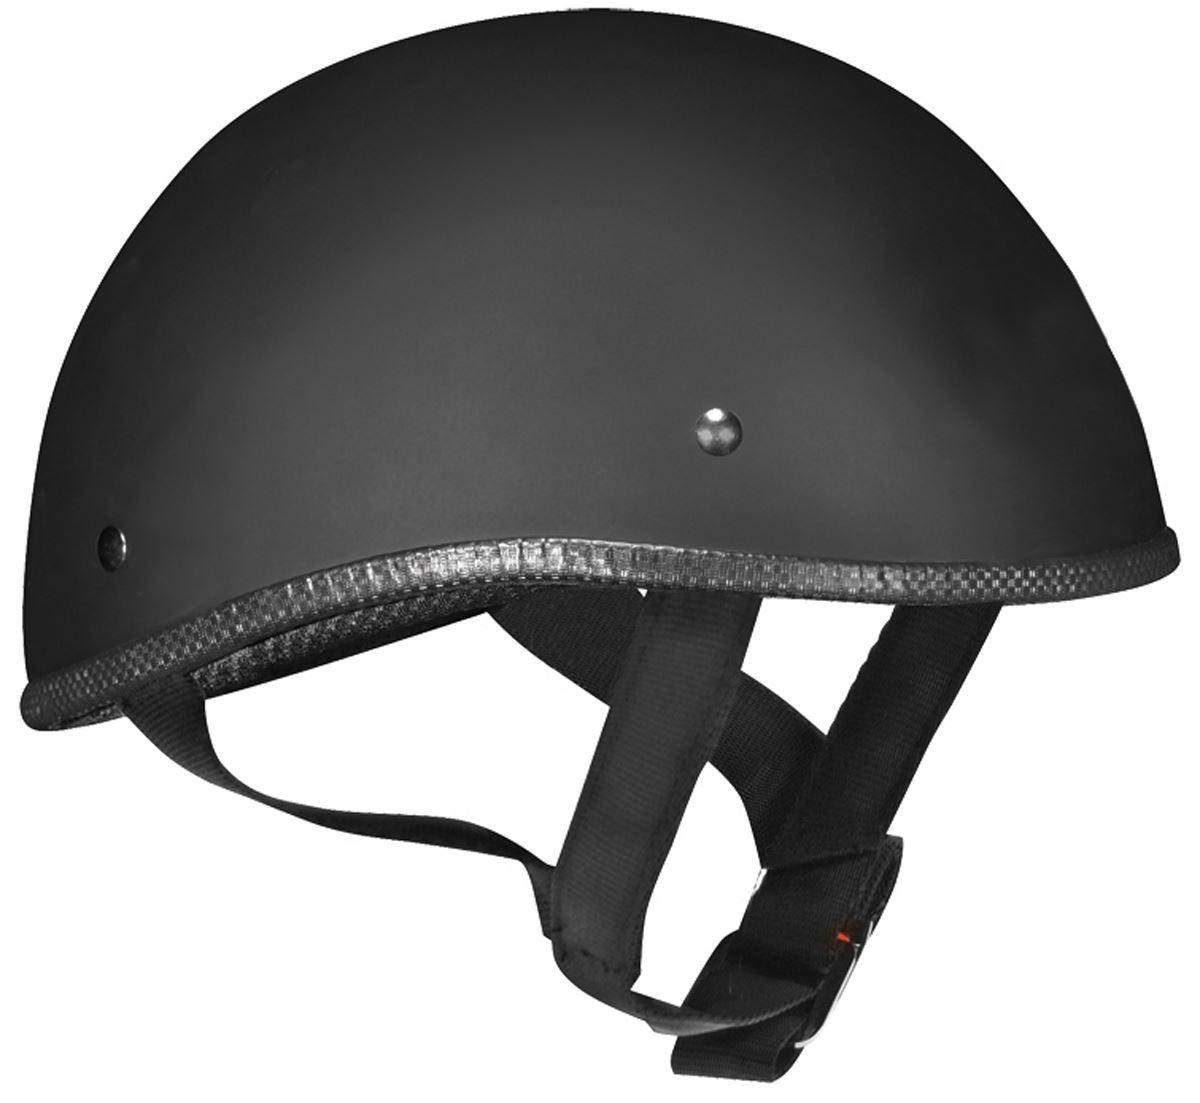 Where to buy Vega XTS Naked Leather X-Small Half Helmet